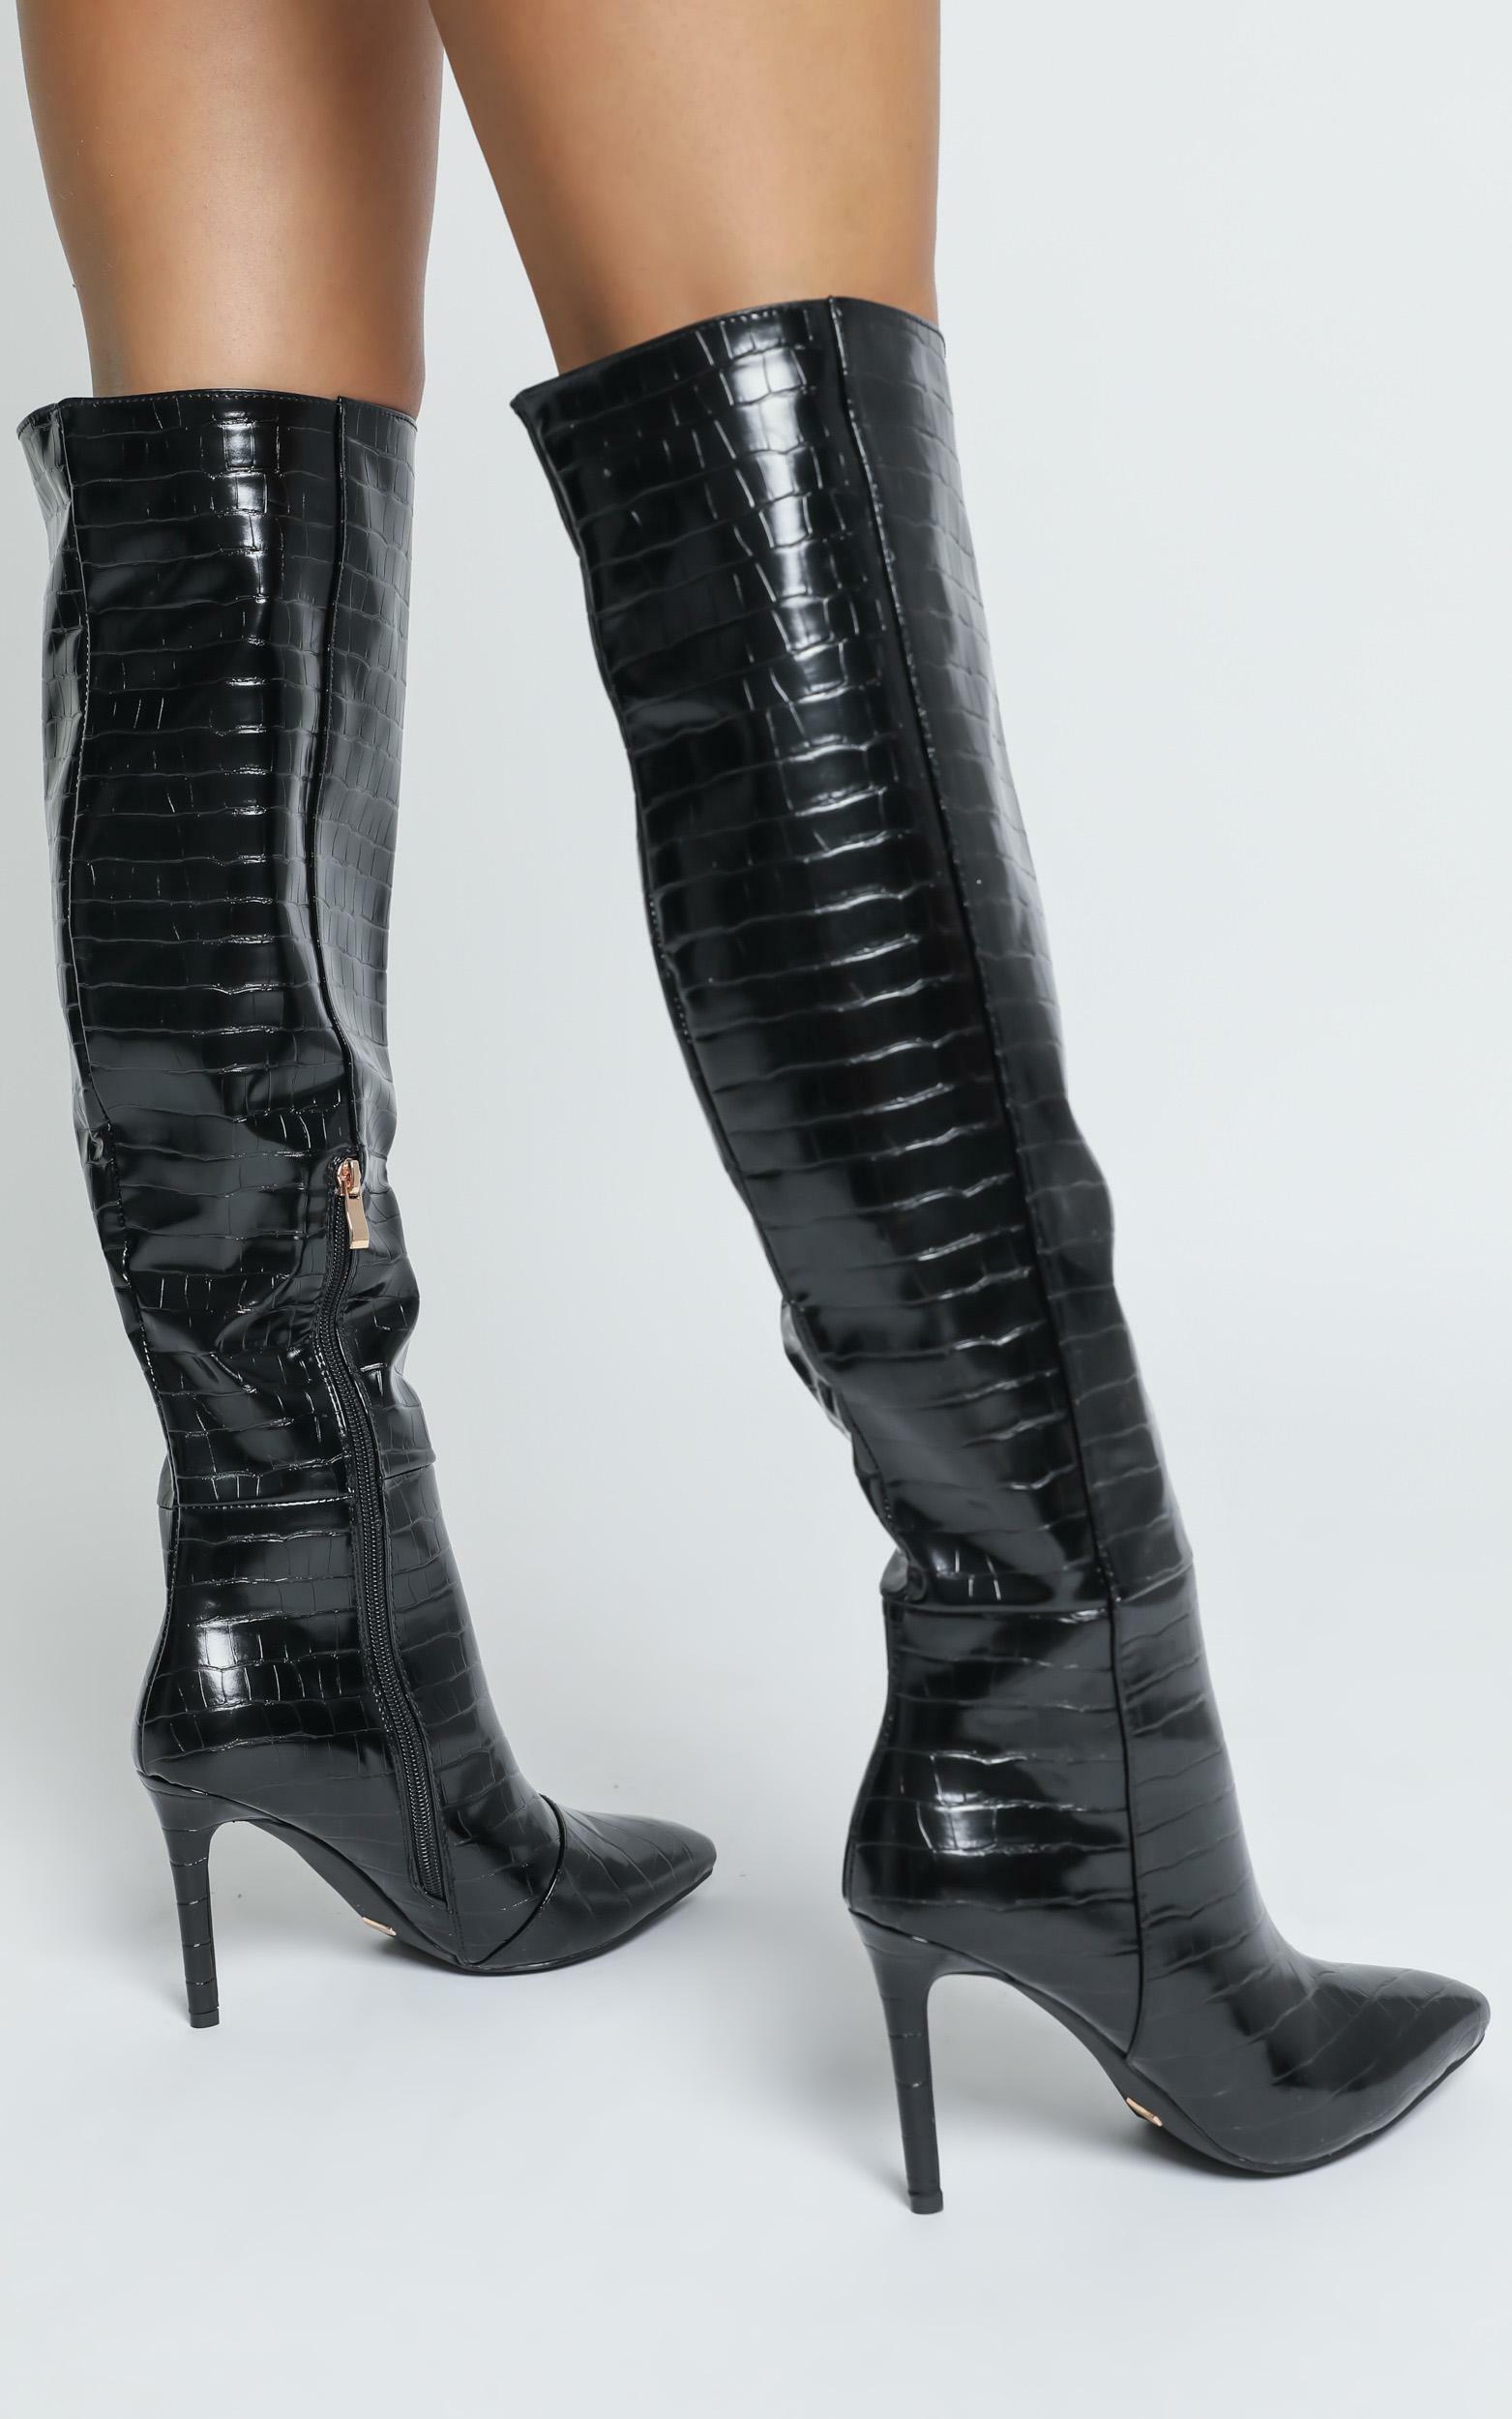 Billini - Naveen Boots in black croc - 5, BLK8, hi-res image number null